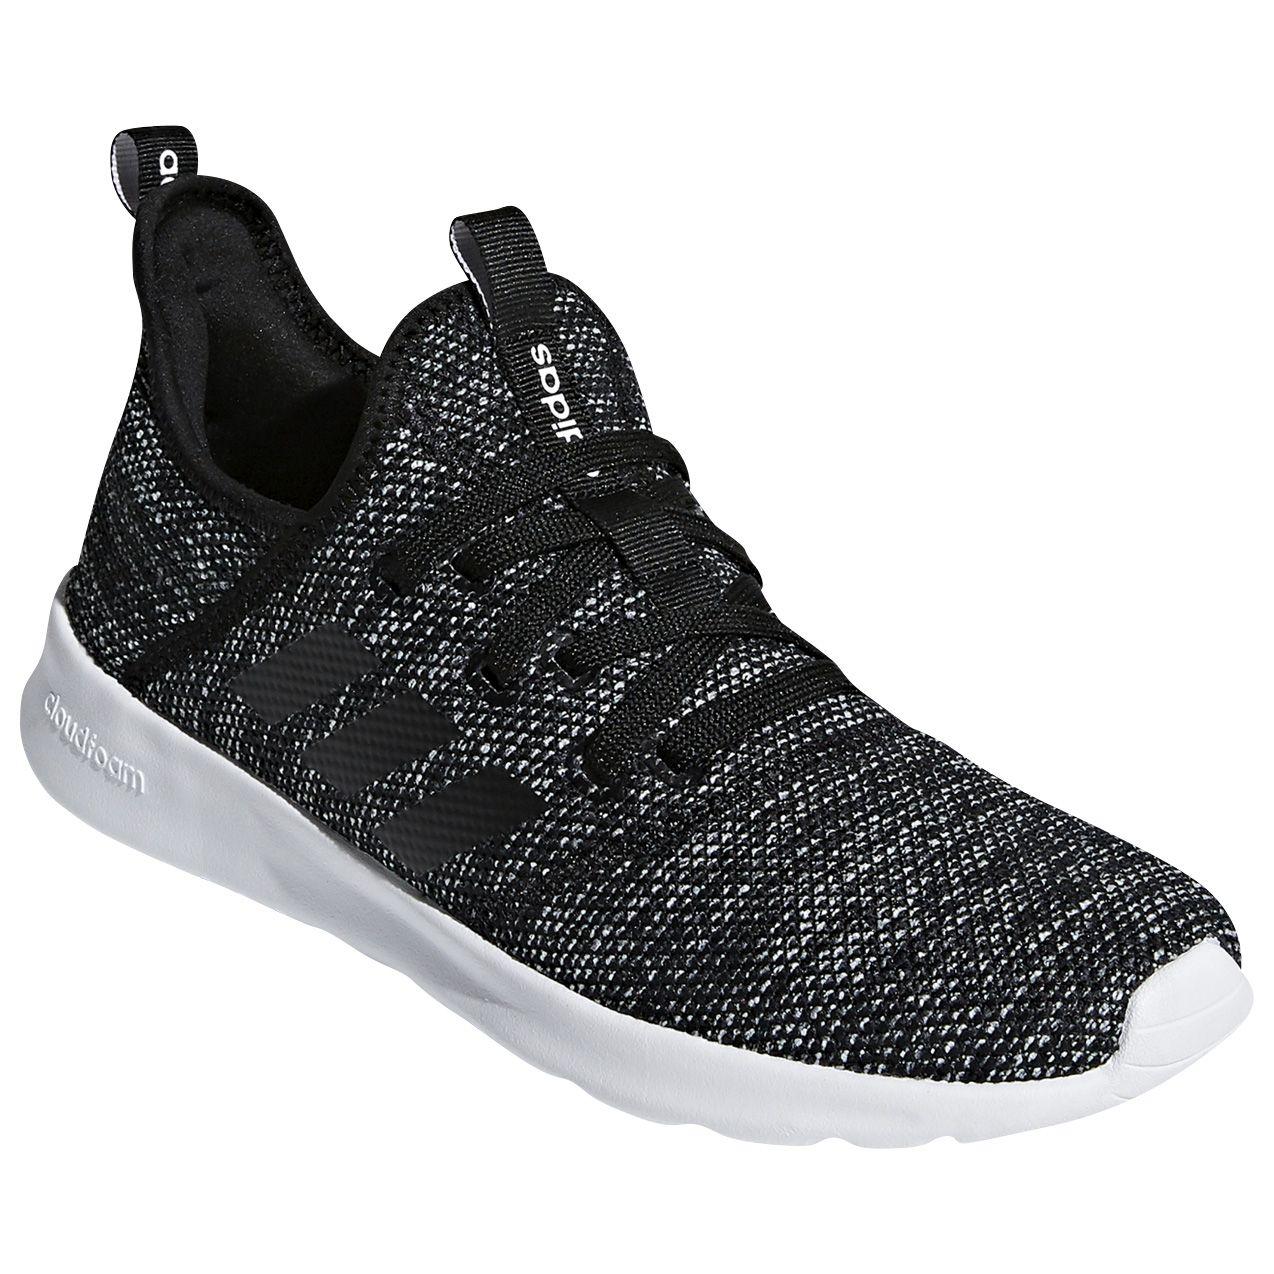 Fingerhut - adidas Women's Cloudfoam Pure Running Shoe